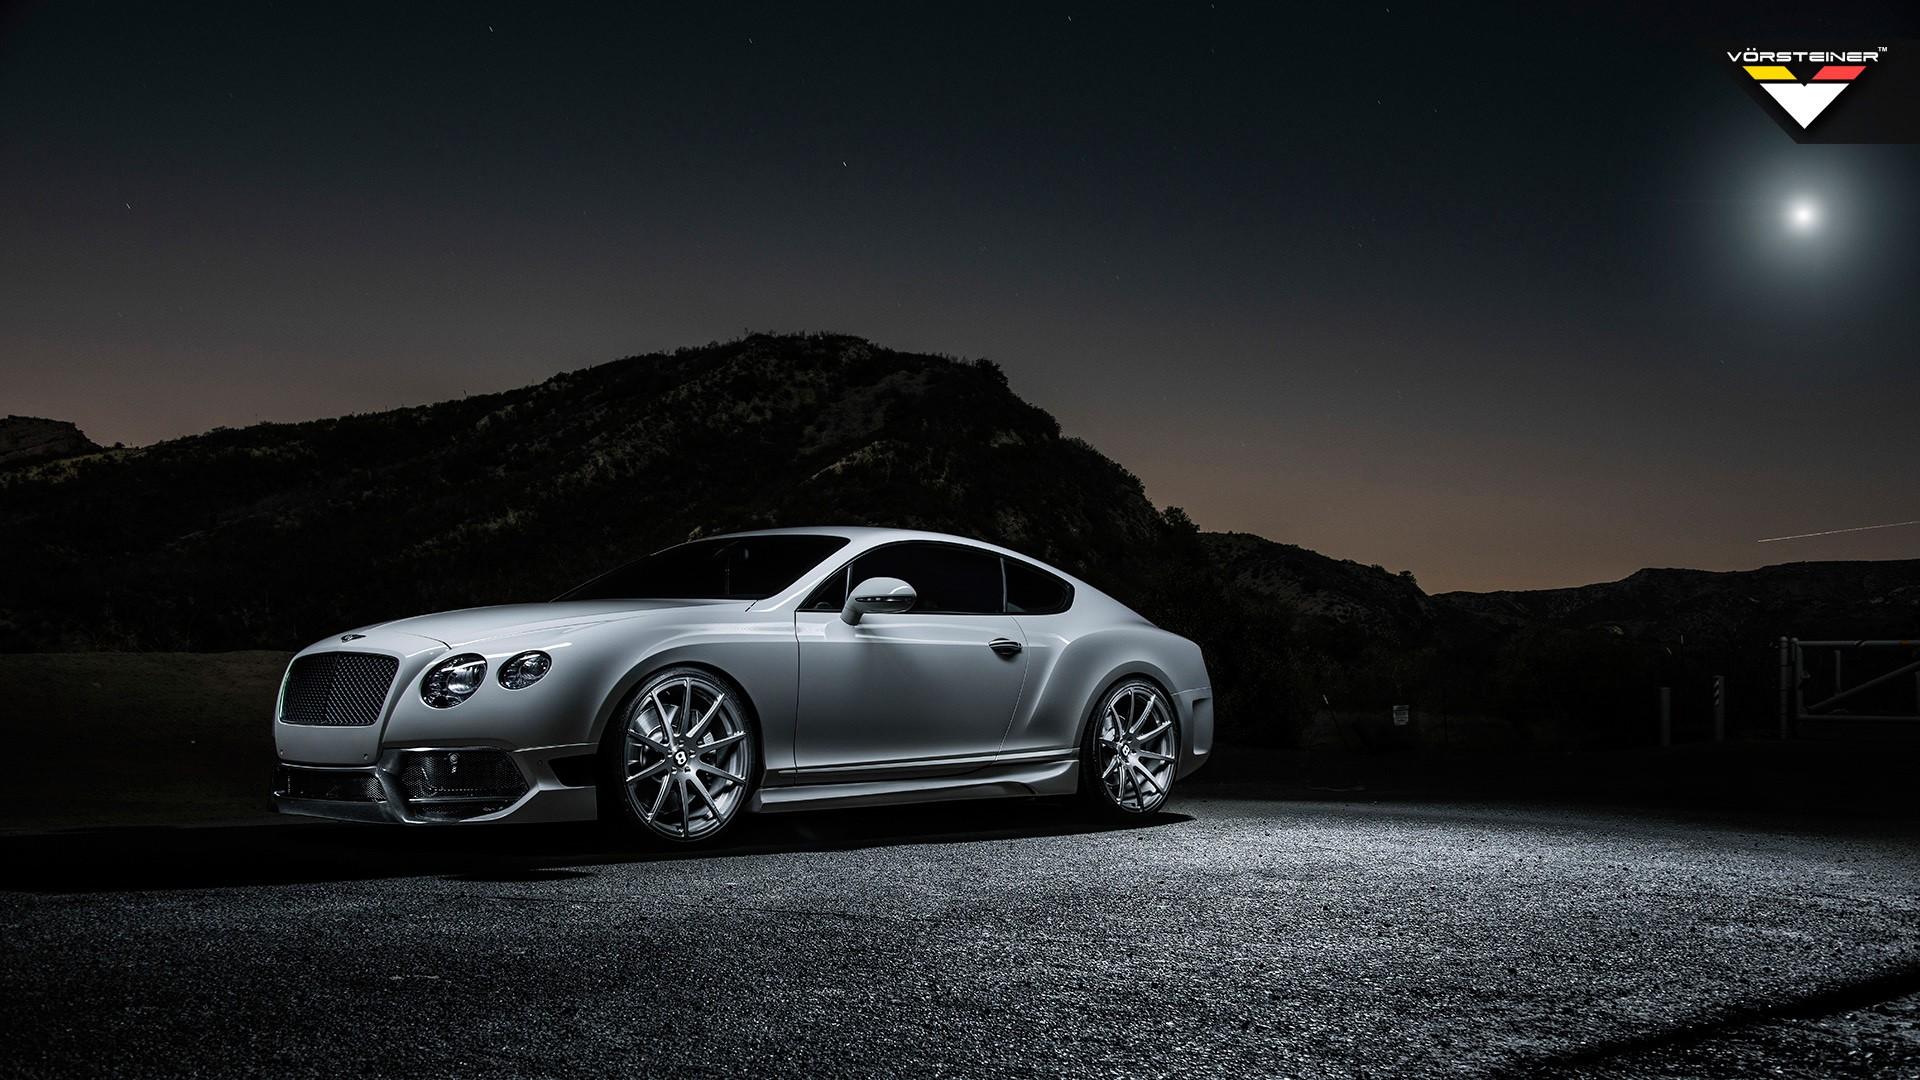 2013 Vorsteiner Bentley Continental GT BR10 RS Wallpaper